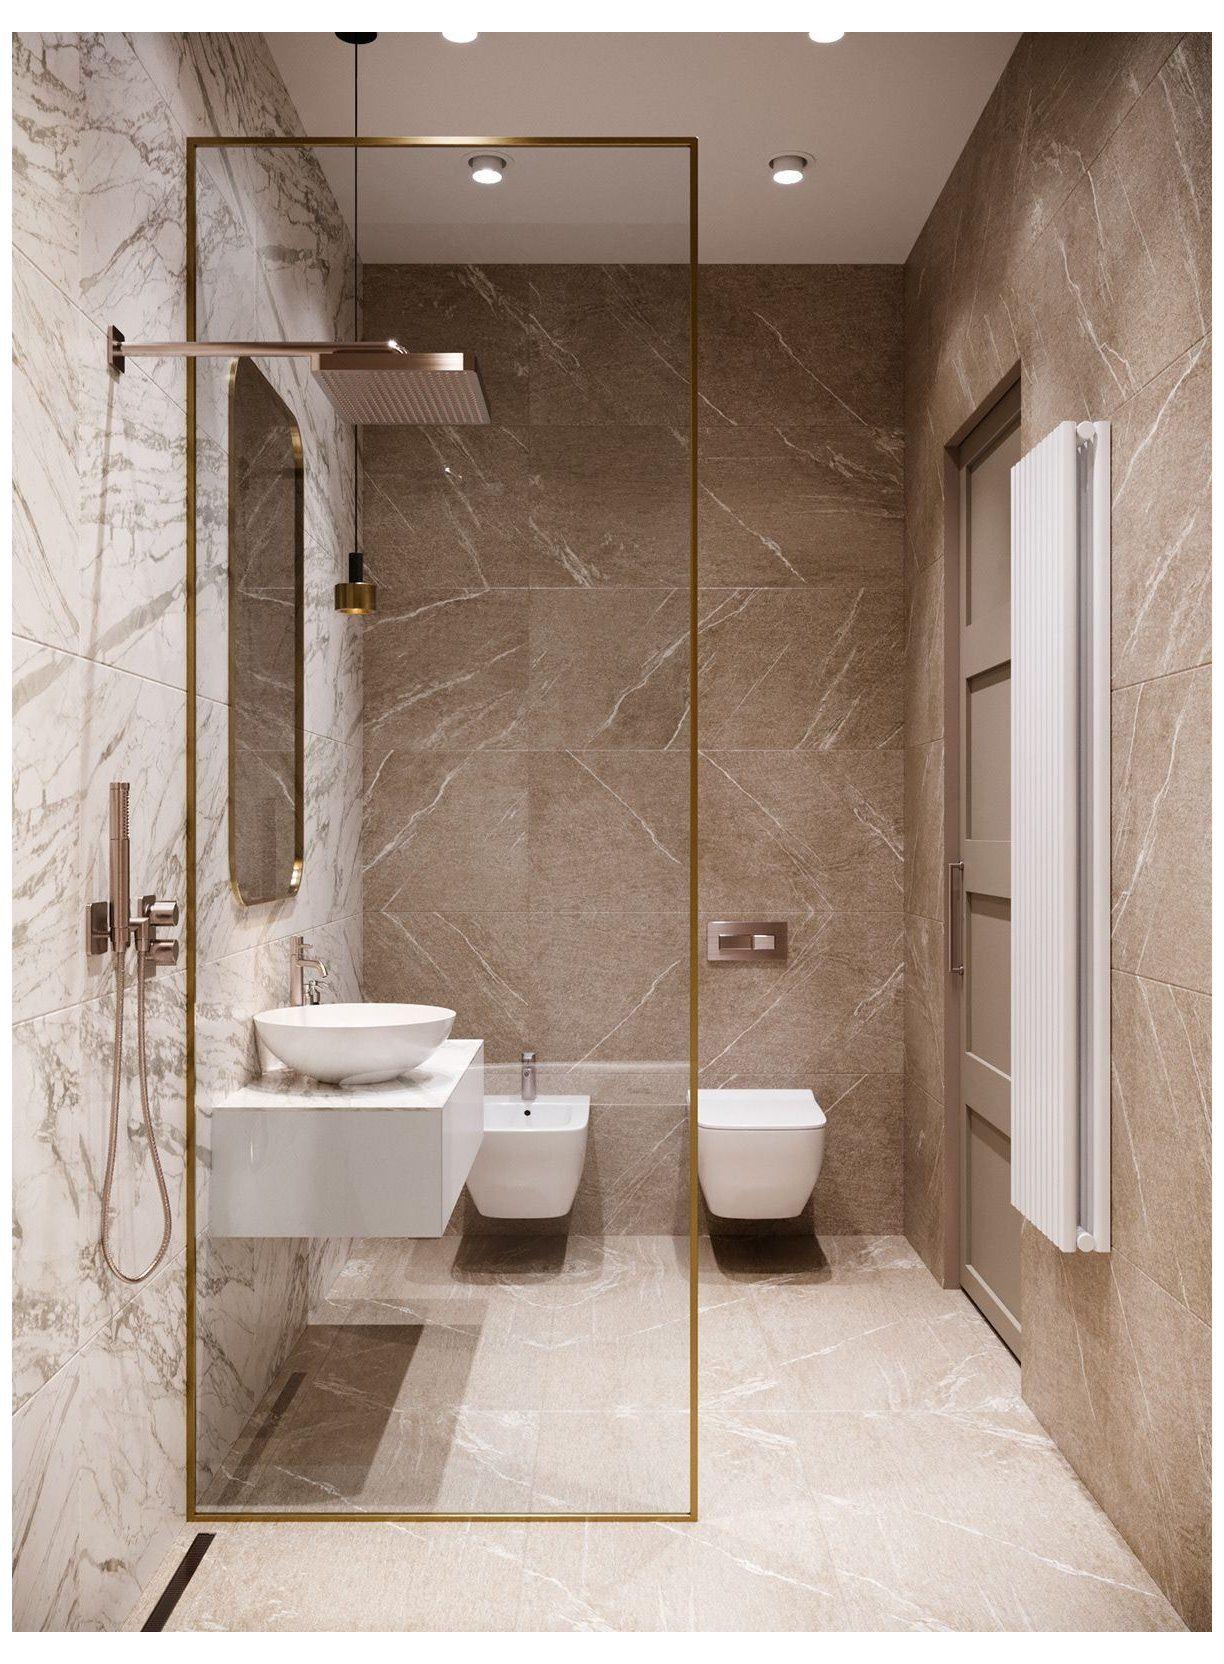 Marble Bathroom Design Small Luxury Bathroomdesignsmallluxury In 2021 Marble Bathroom Designs Washroom Design Bathroom Design Small